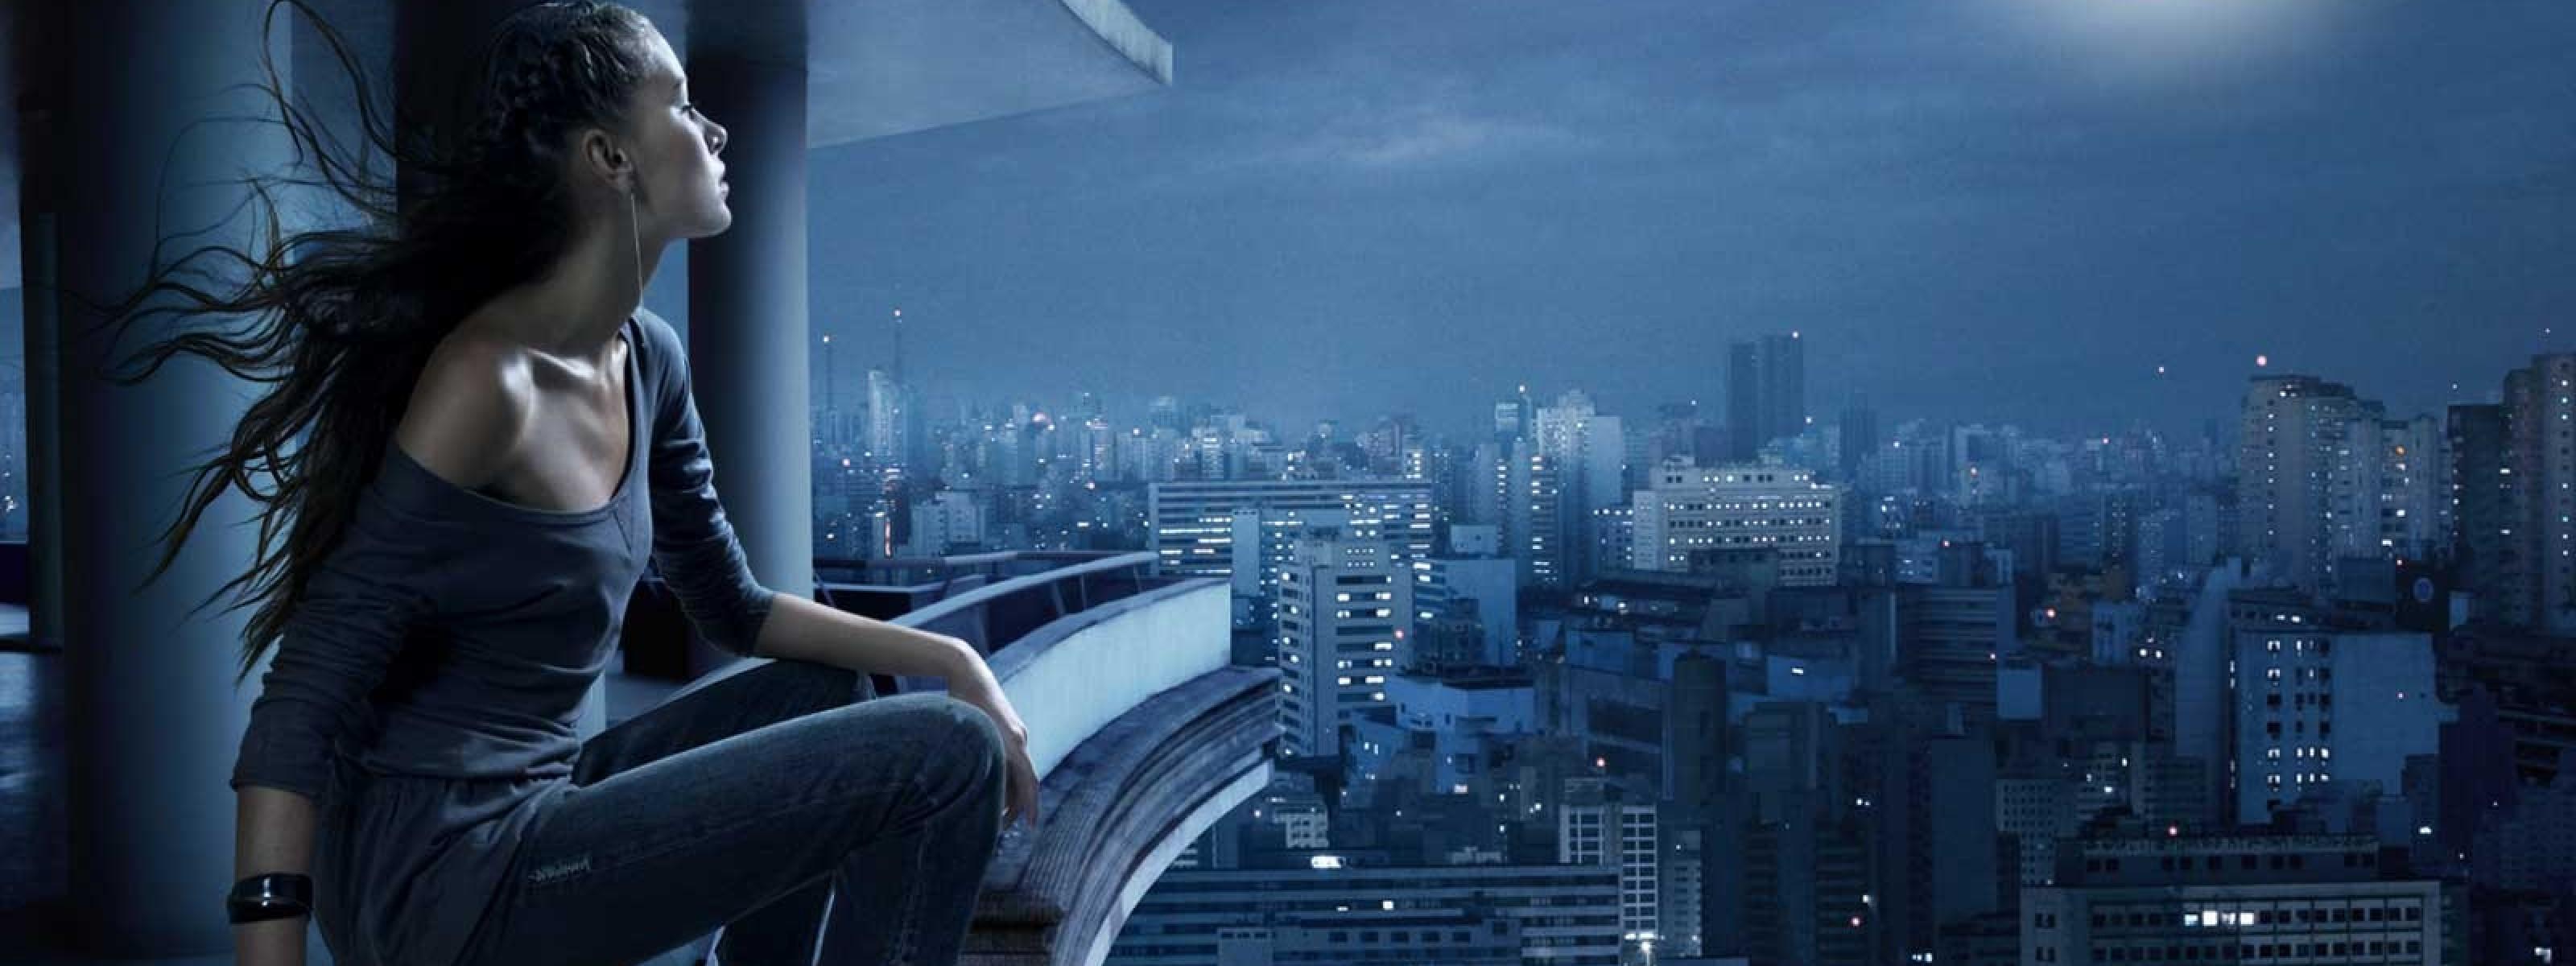 Hd Wallpapers Brooklyn Bridge Panorama Dual Monitor Otherjpg 2560 X 3200x1200